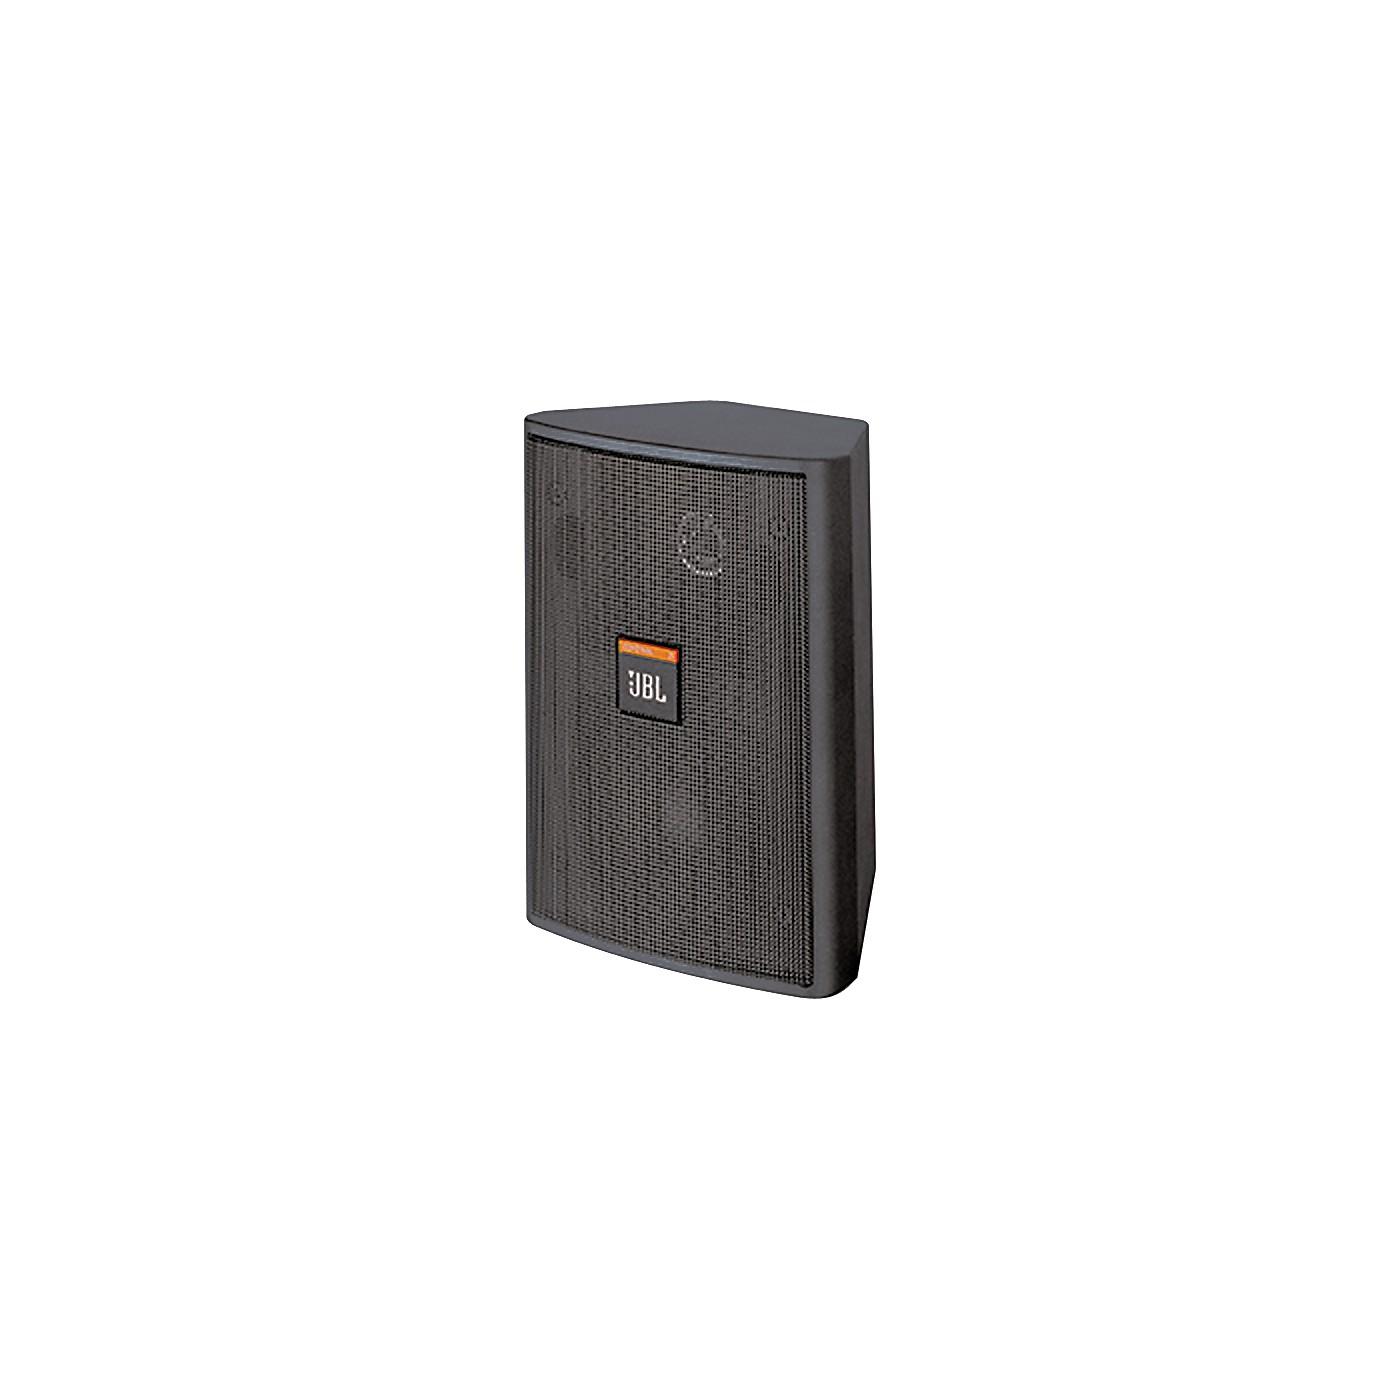 JBL Control 23 3.5IN 2-Way In/Out Spkr Pr thumbnail